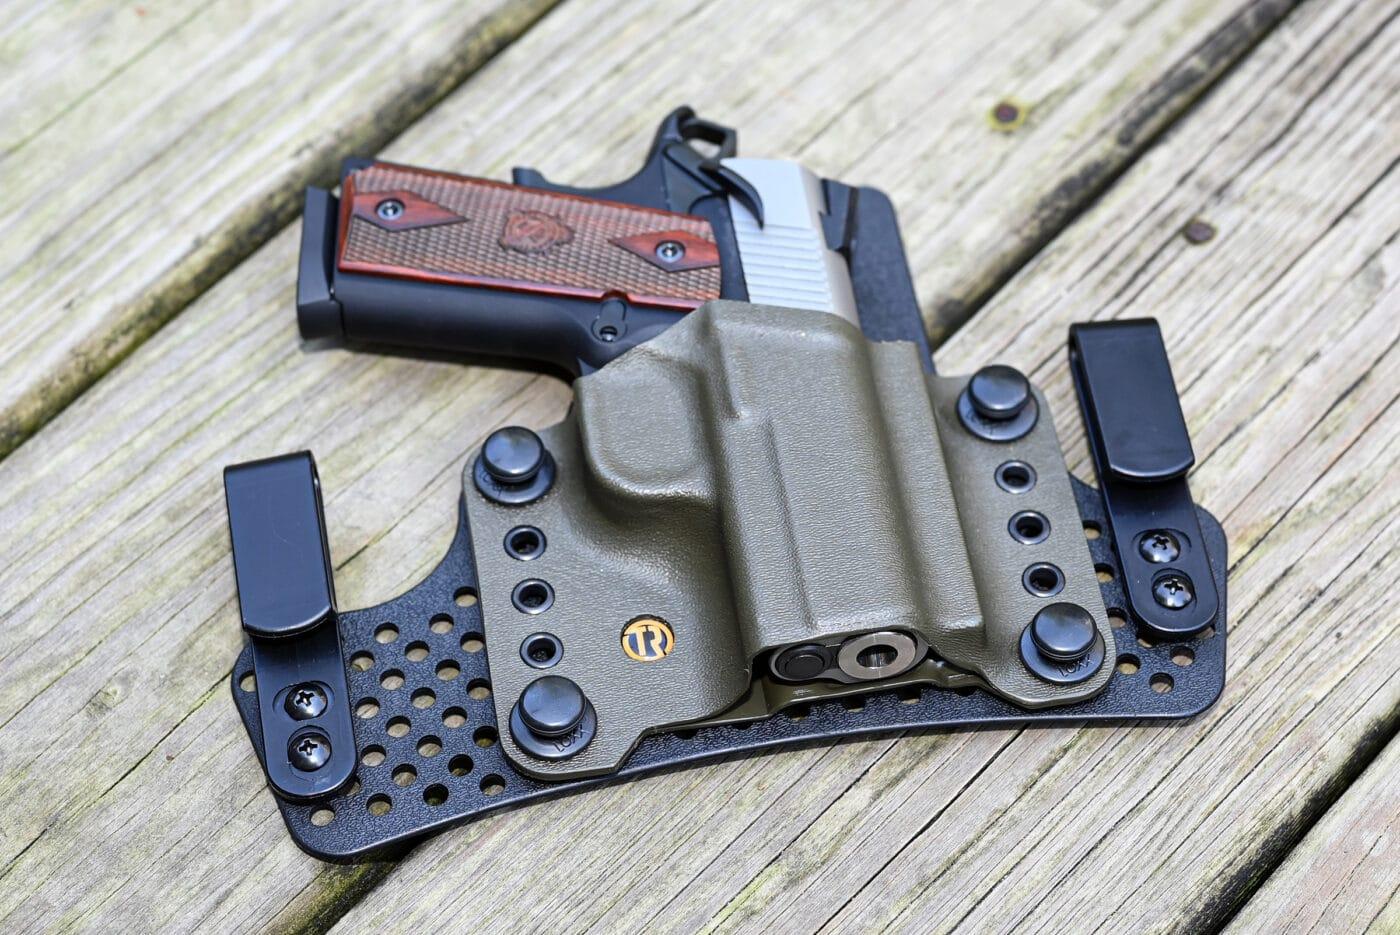 TacRig modular CCW holster for EMP pistol